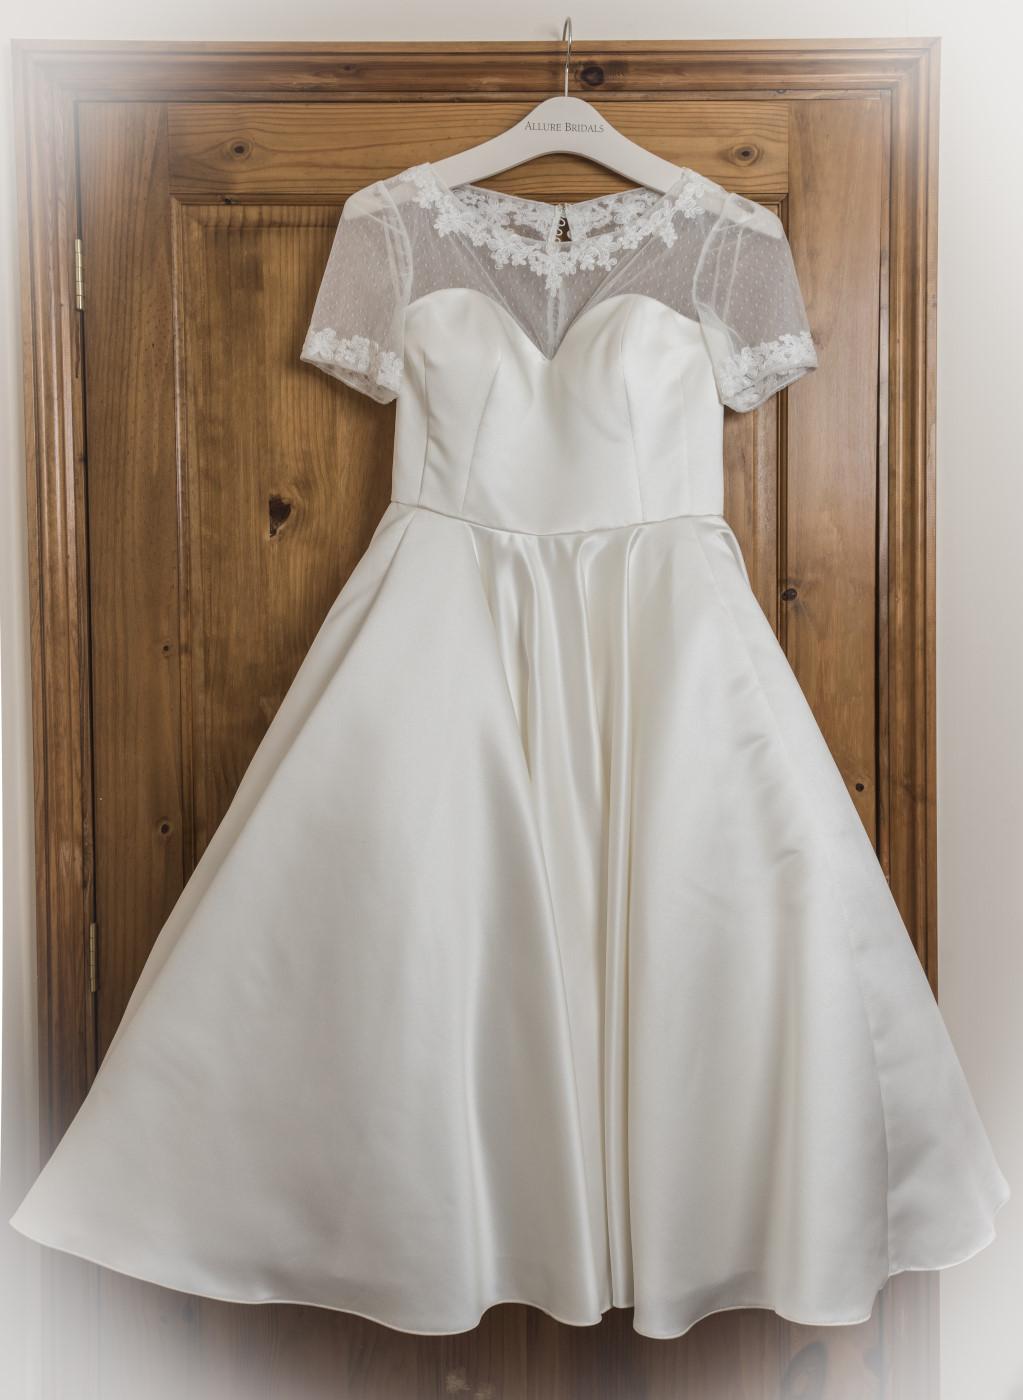 brides dress wedding photographer in Peterborough